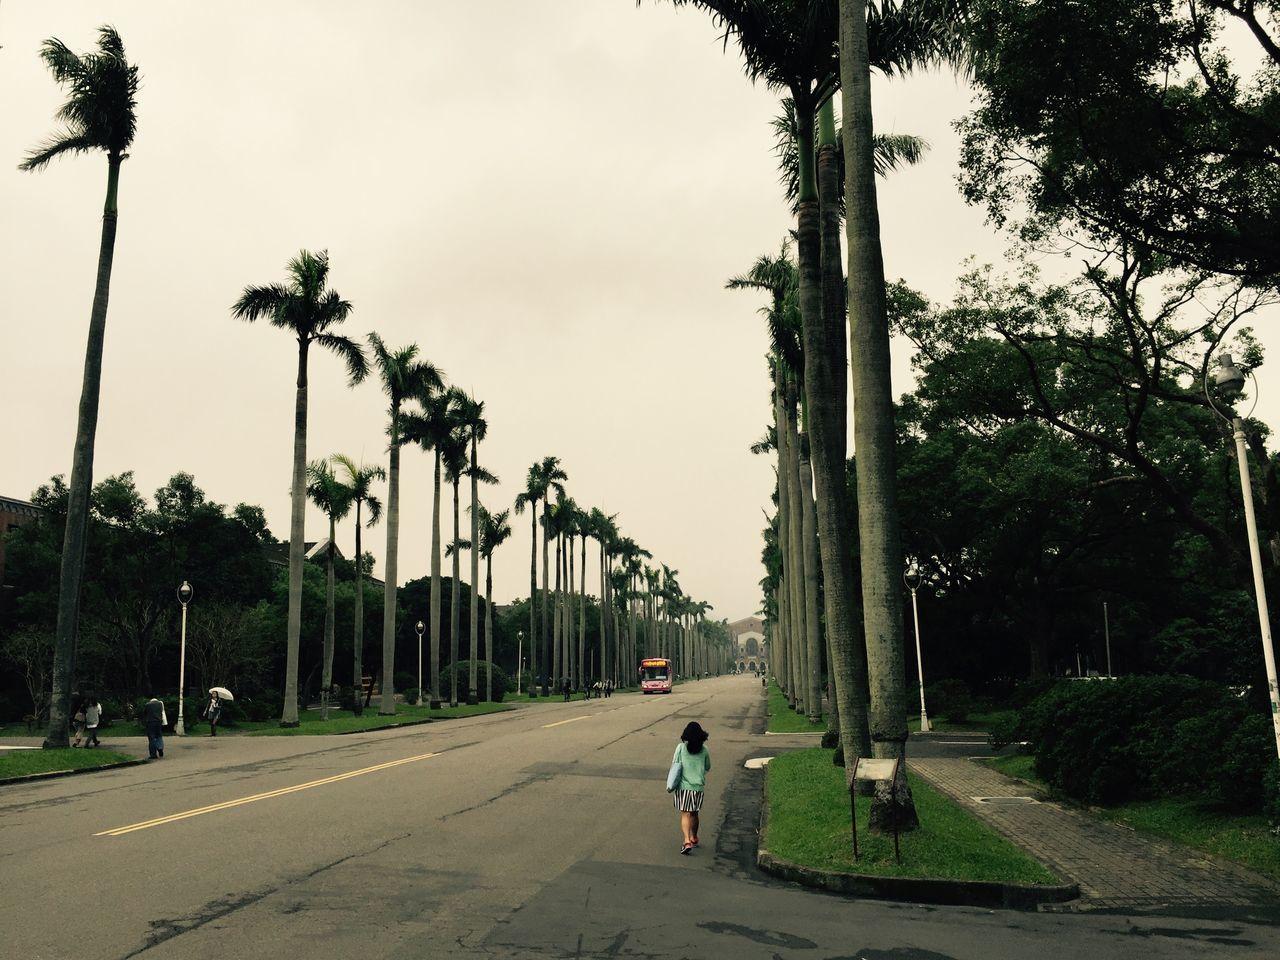 Campus Gongguan Taipei Taiwan University 國立臺灣大學 National Taiwan University  大學 臺大